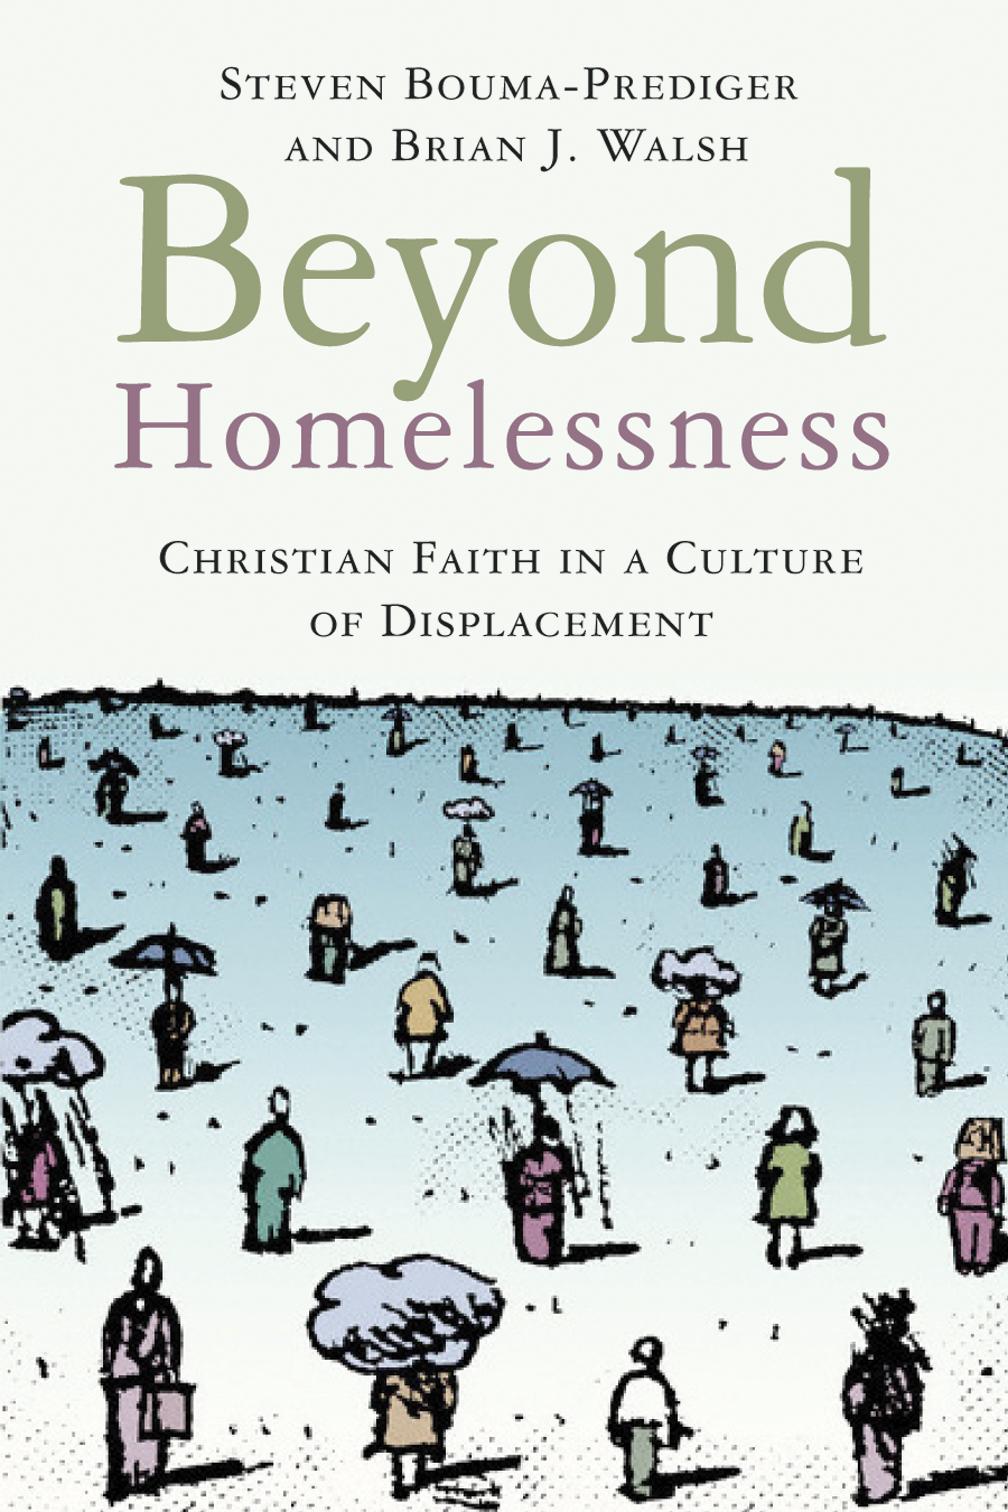 Quotes About Homelessness Beyond Homelessness  Steven Boumaprediger Brian Jwalsh  Eerdmans